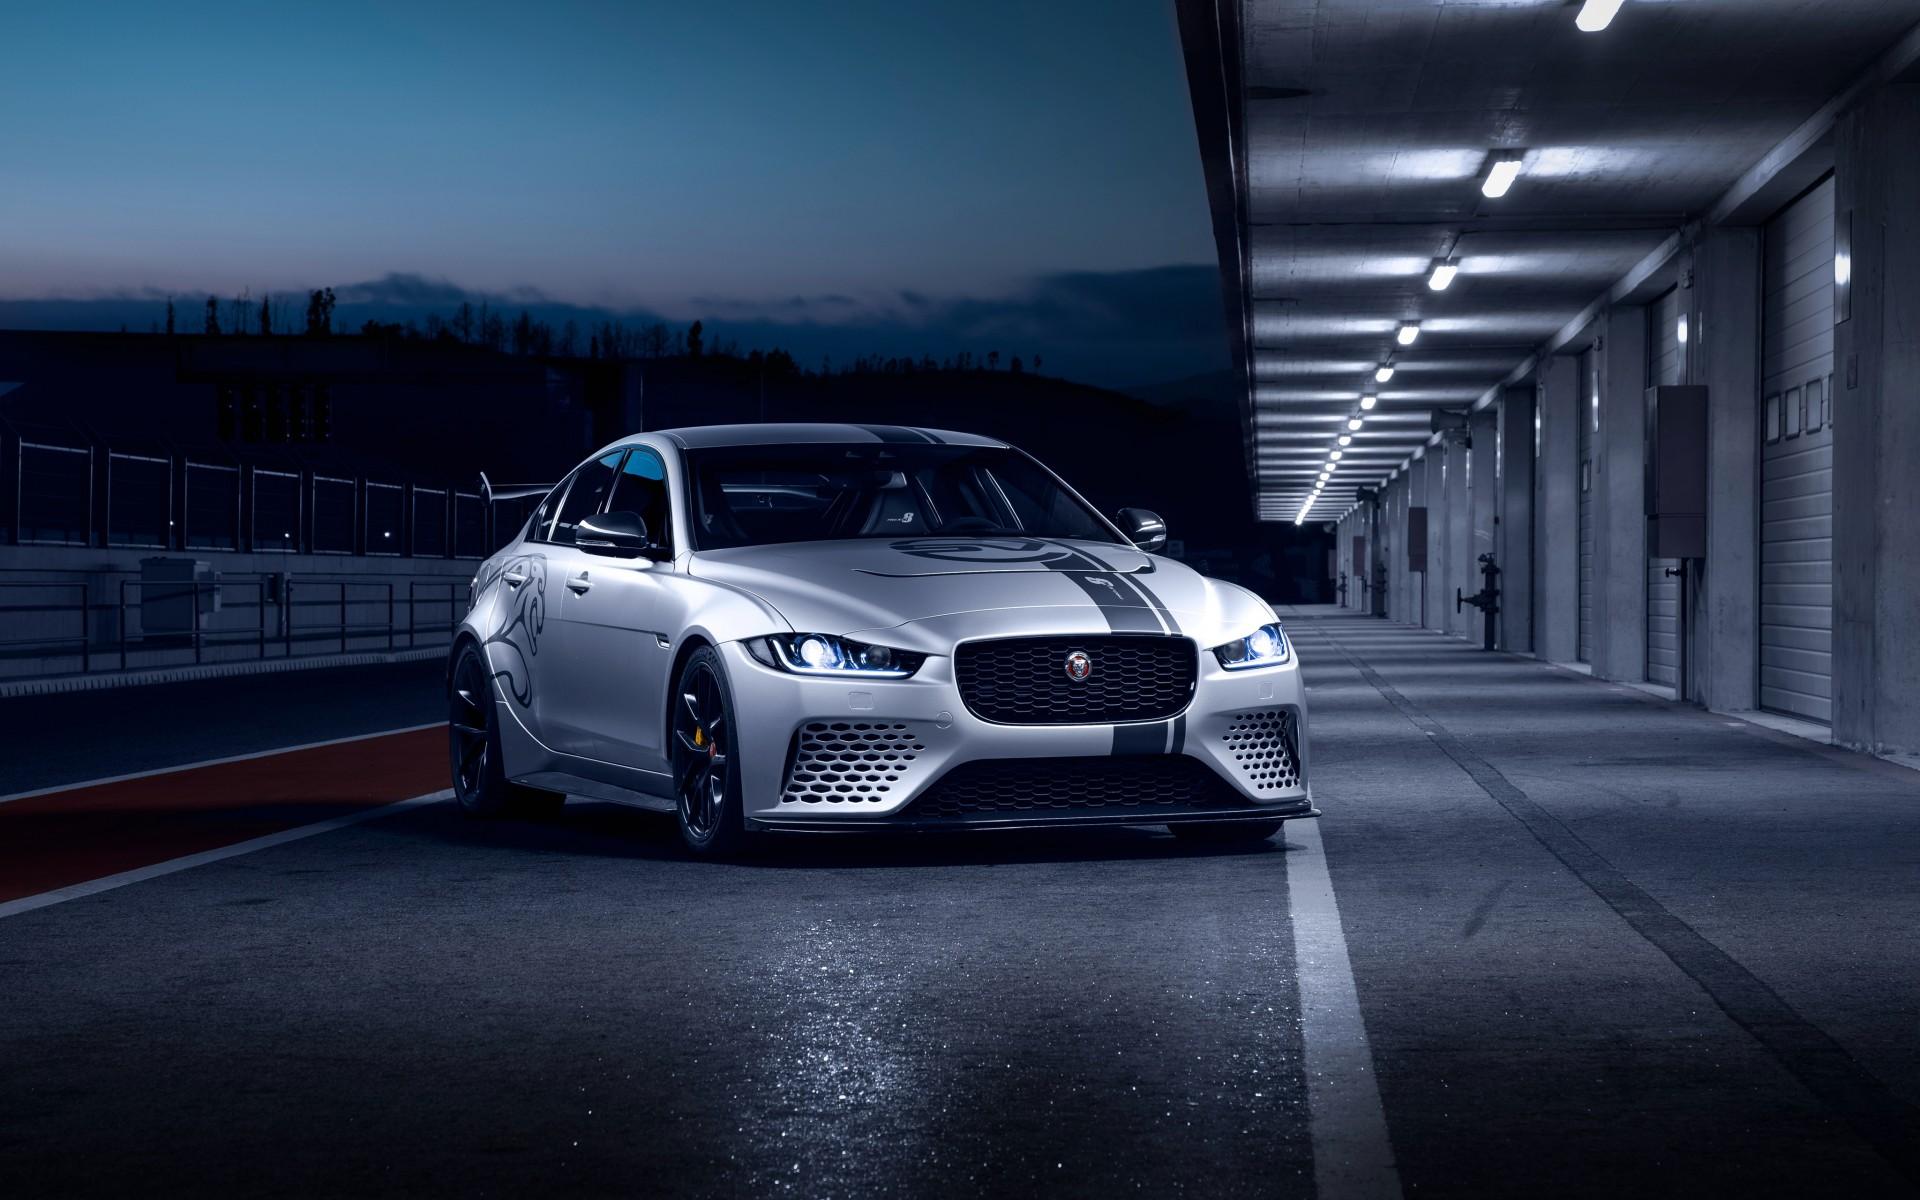 3d Car Wallpapers 1366x768 Jaguar Xe Sv Project 8 4k 2018 Wallpapers Hd Wallpapers